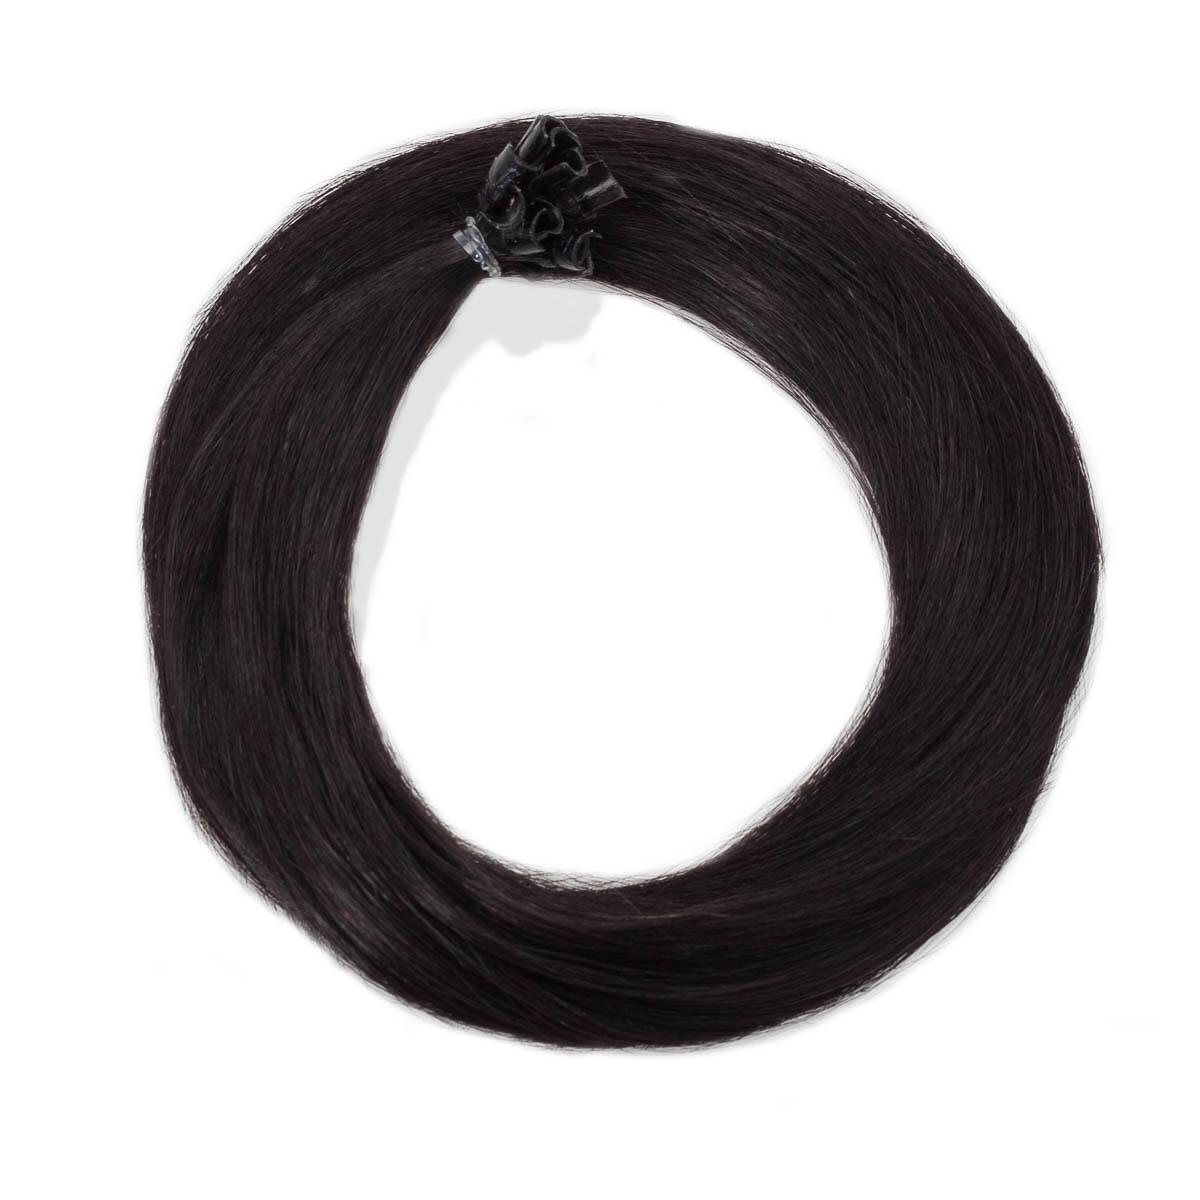 Nail Hair Original 1.2 Black Brown 50 cm